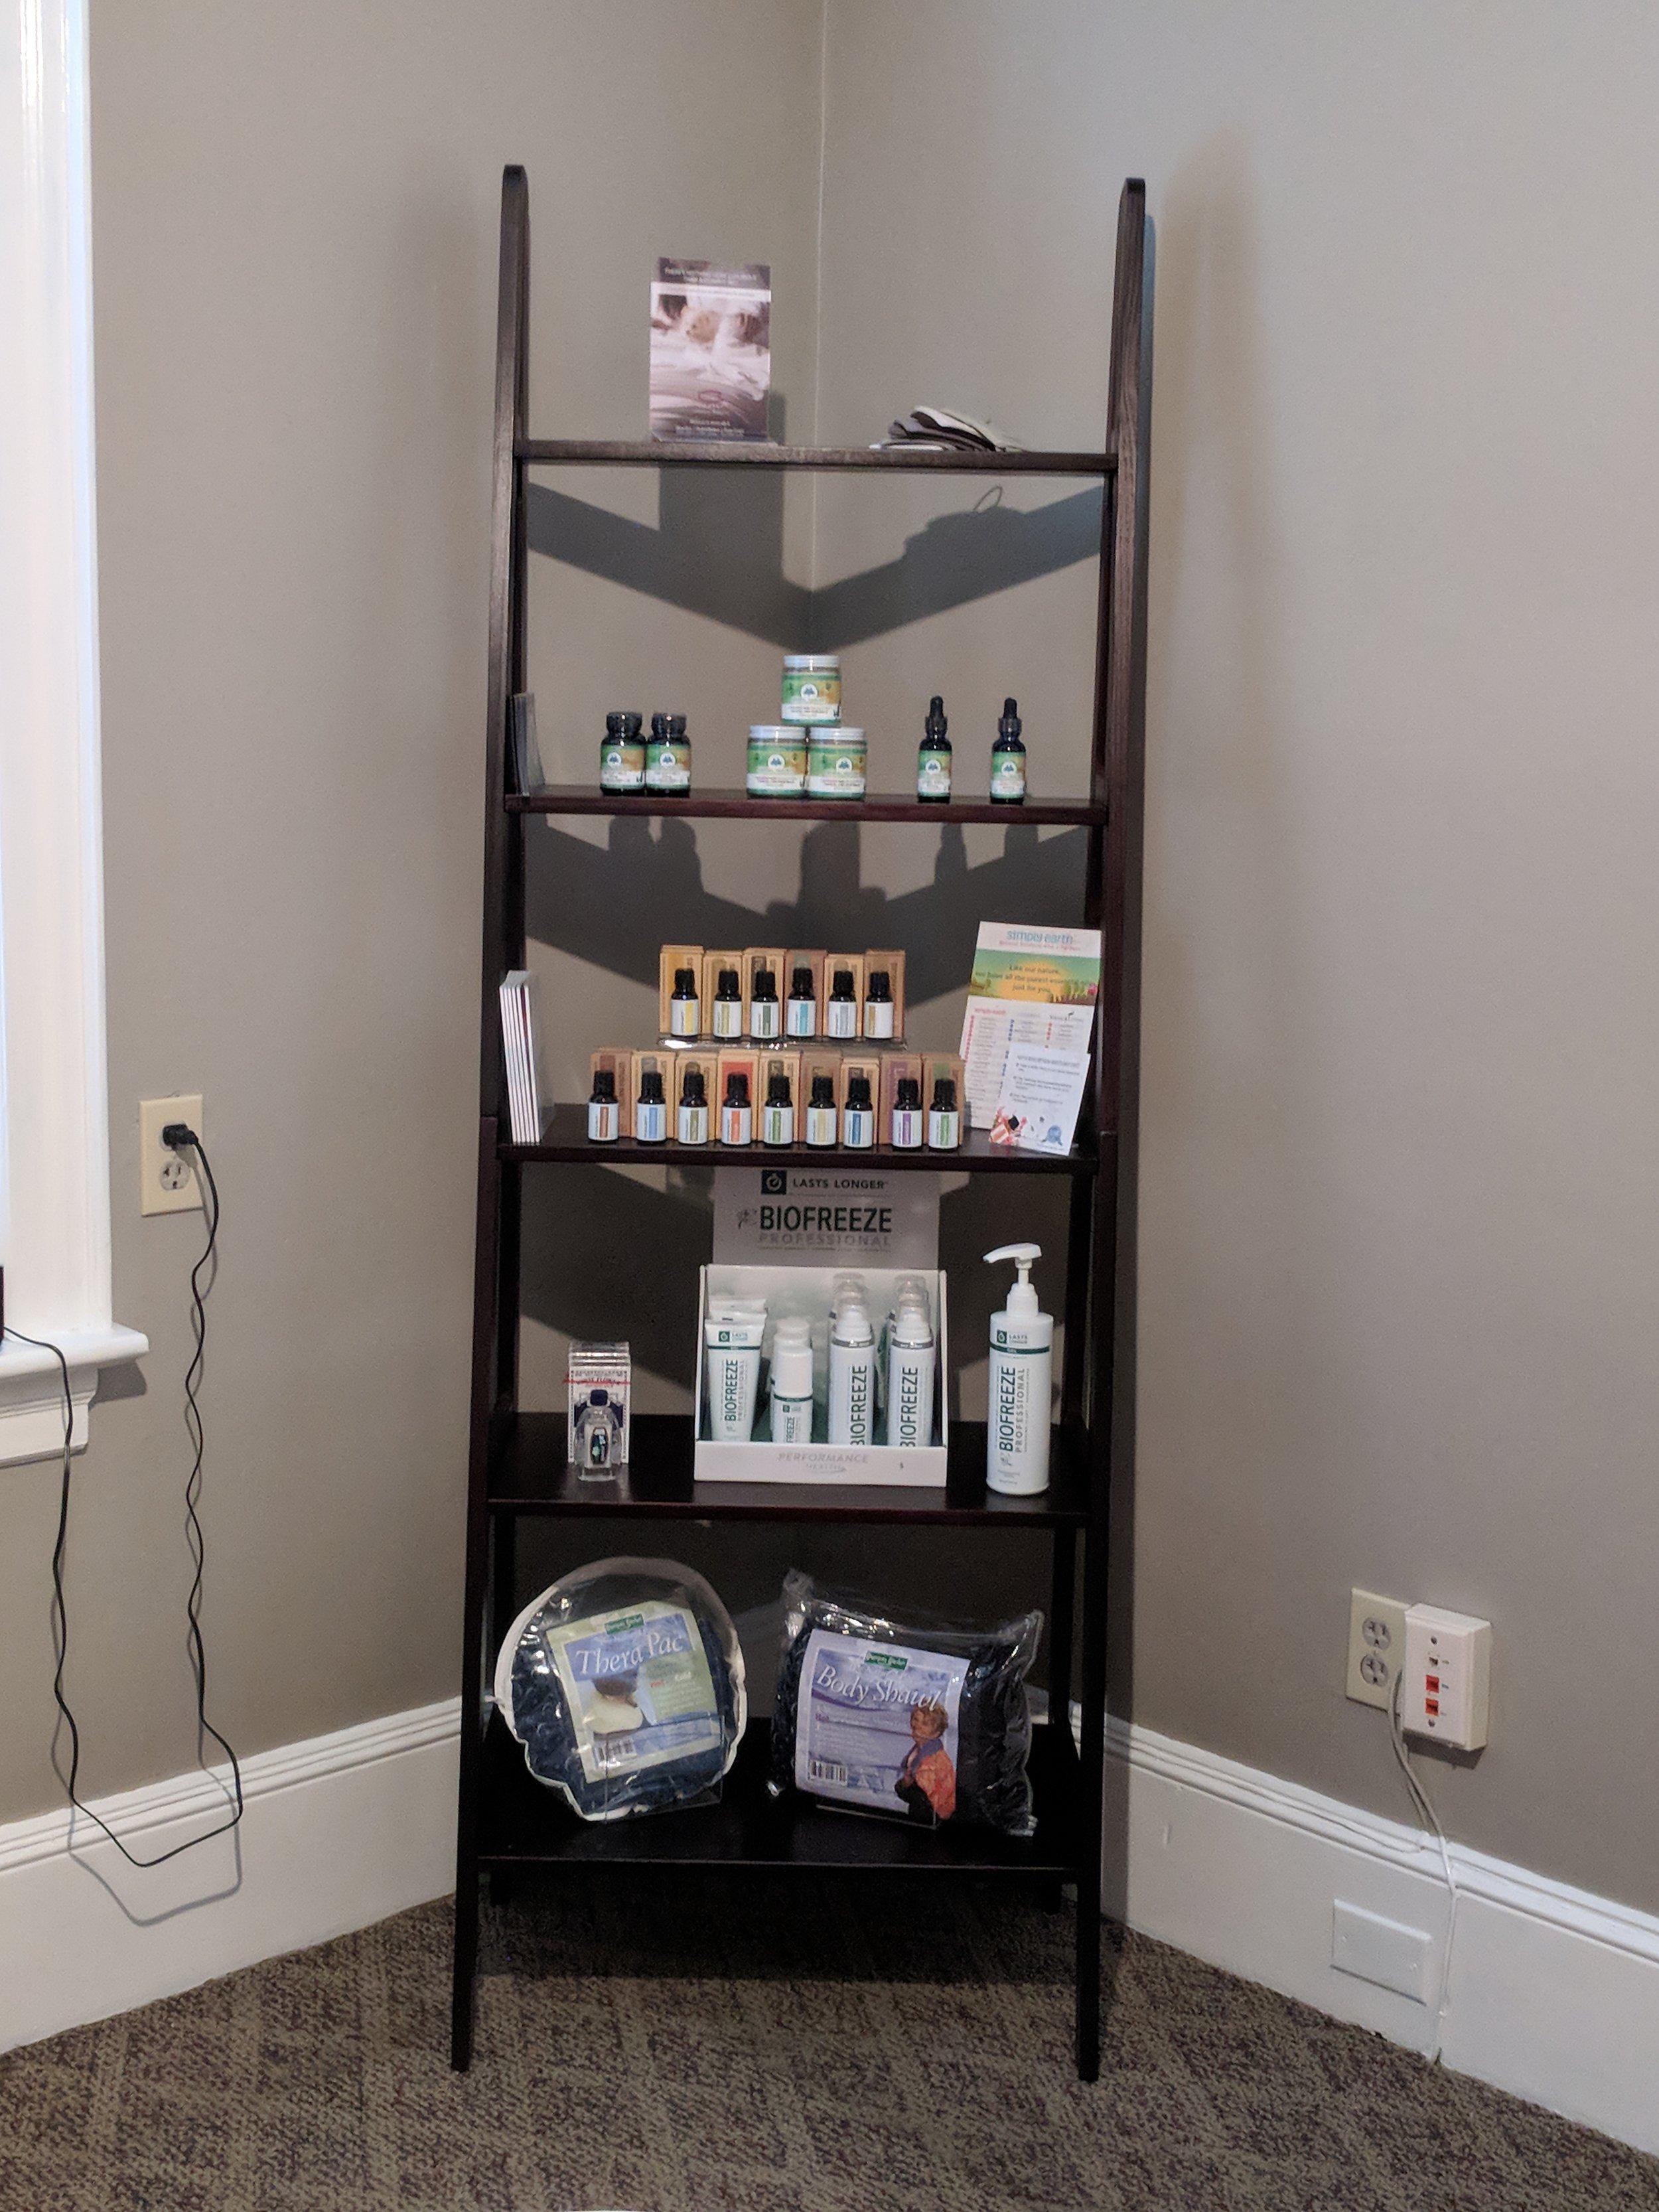 Retail shelving Herbal Healers CBD Simply Earth essential oils Grampa's Garden Heat Packs Biofreeze